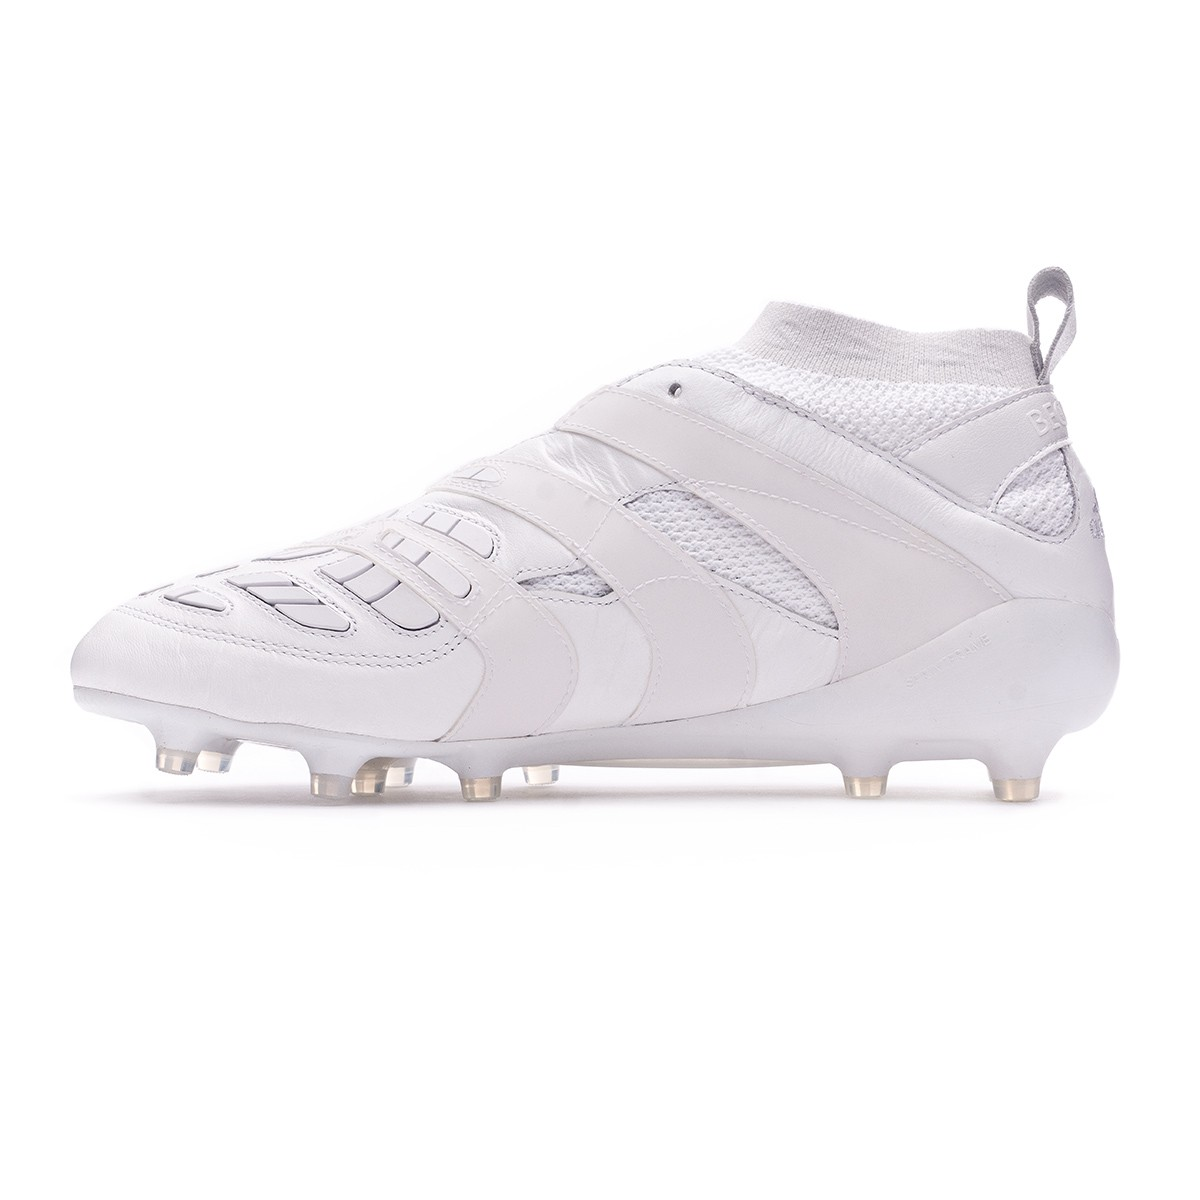 691e4b761d10 Football Boots adidas Predator DB Accelerator FG White - Tienda de fútbol  Fútbol Emotion